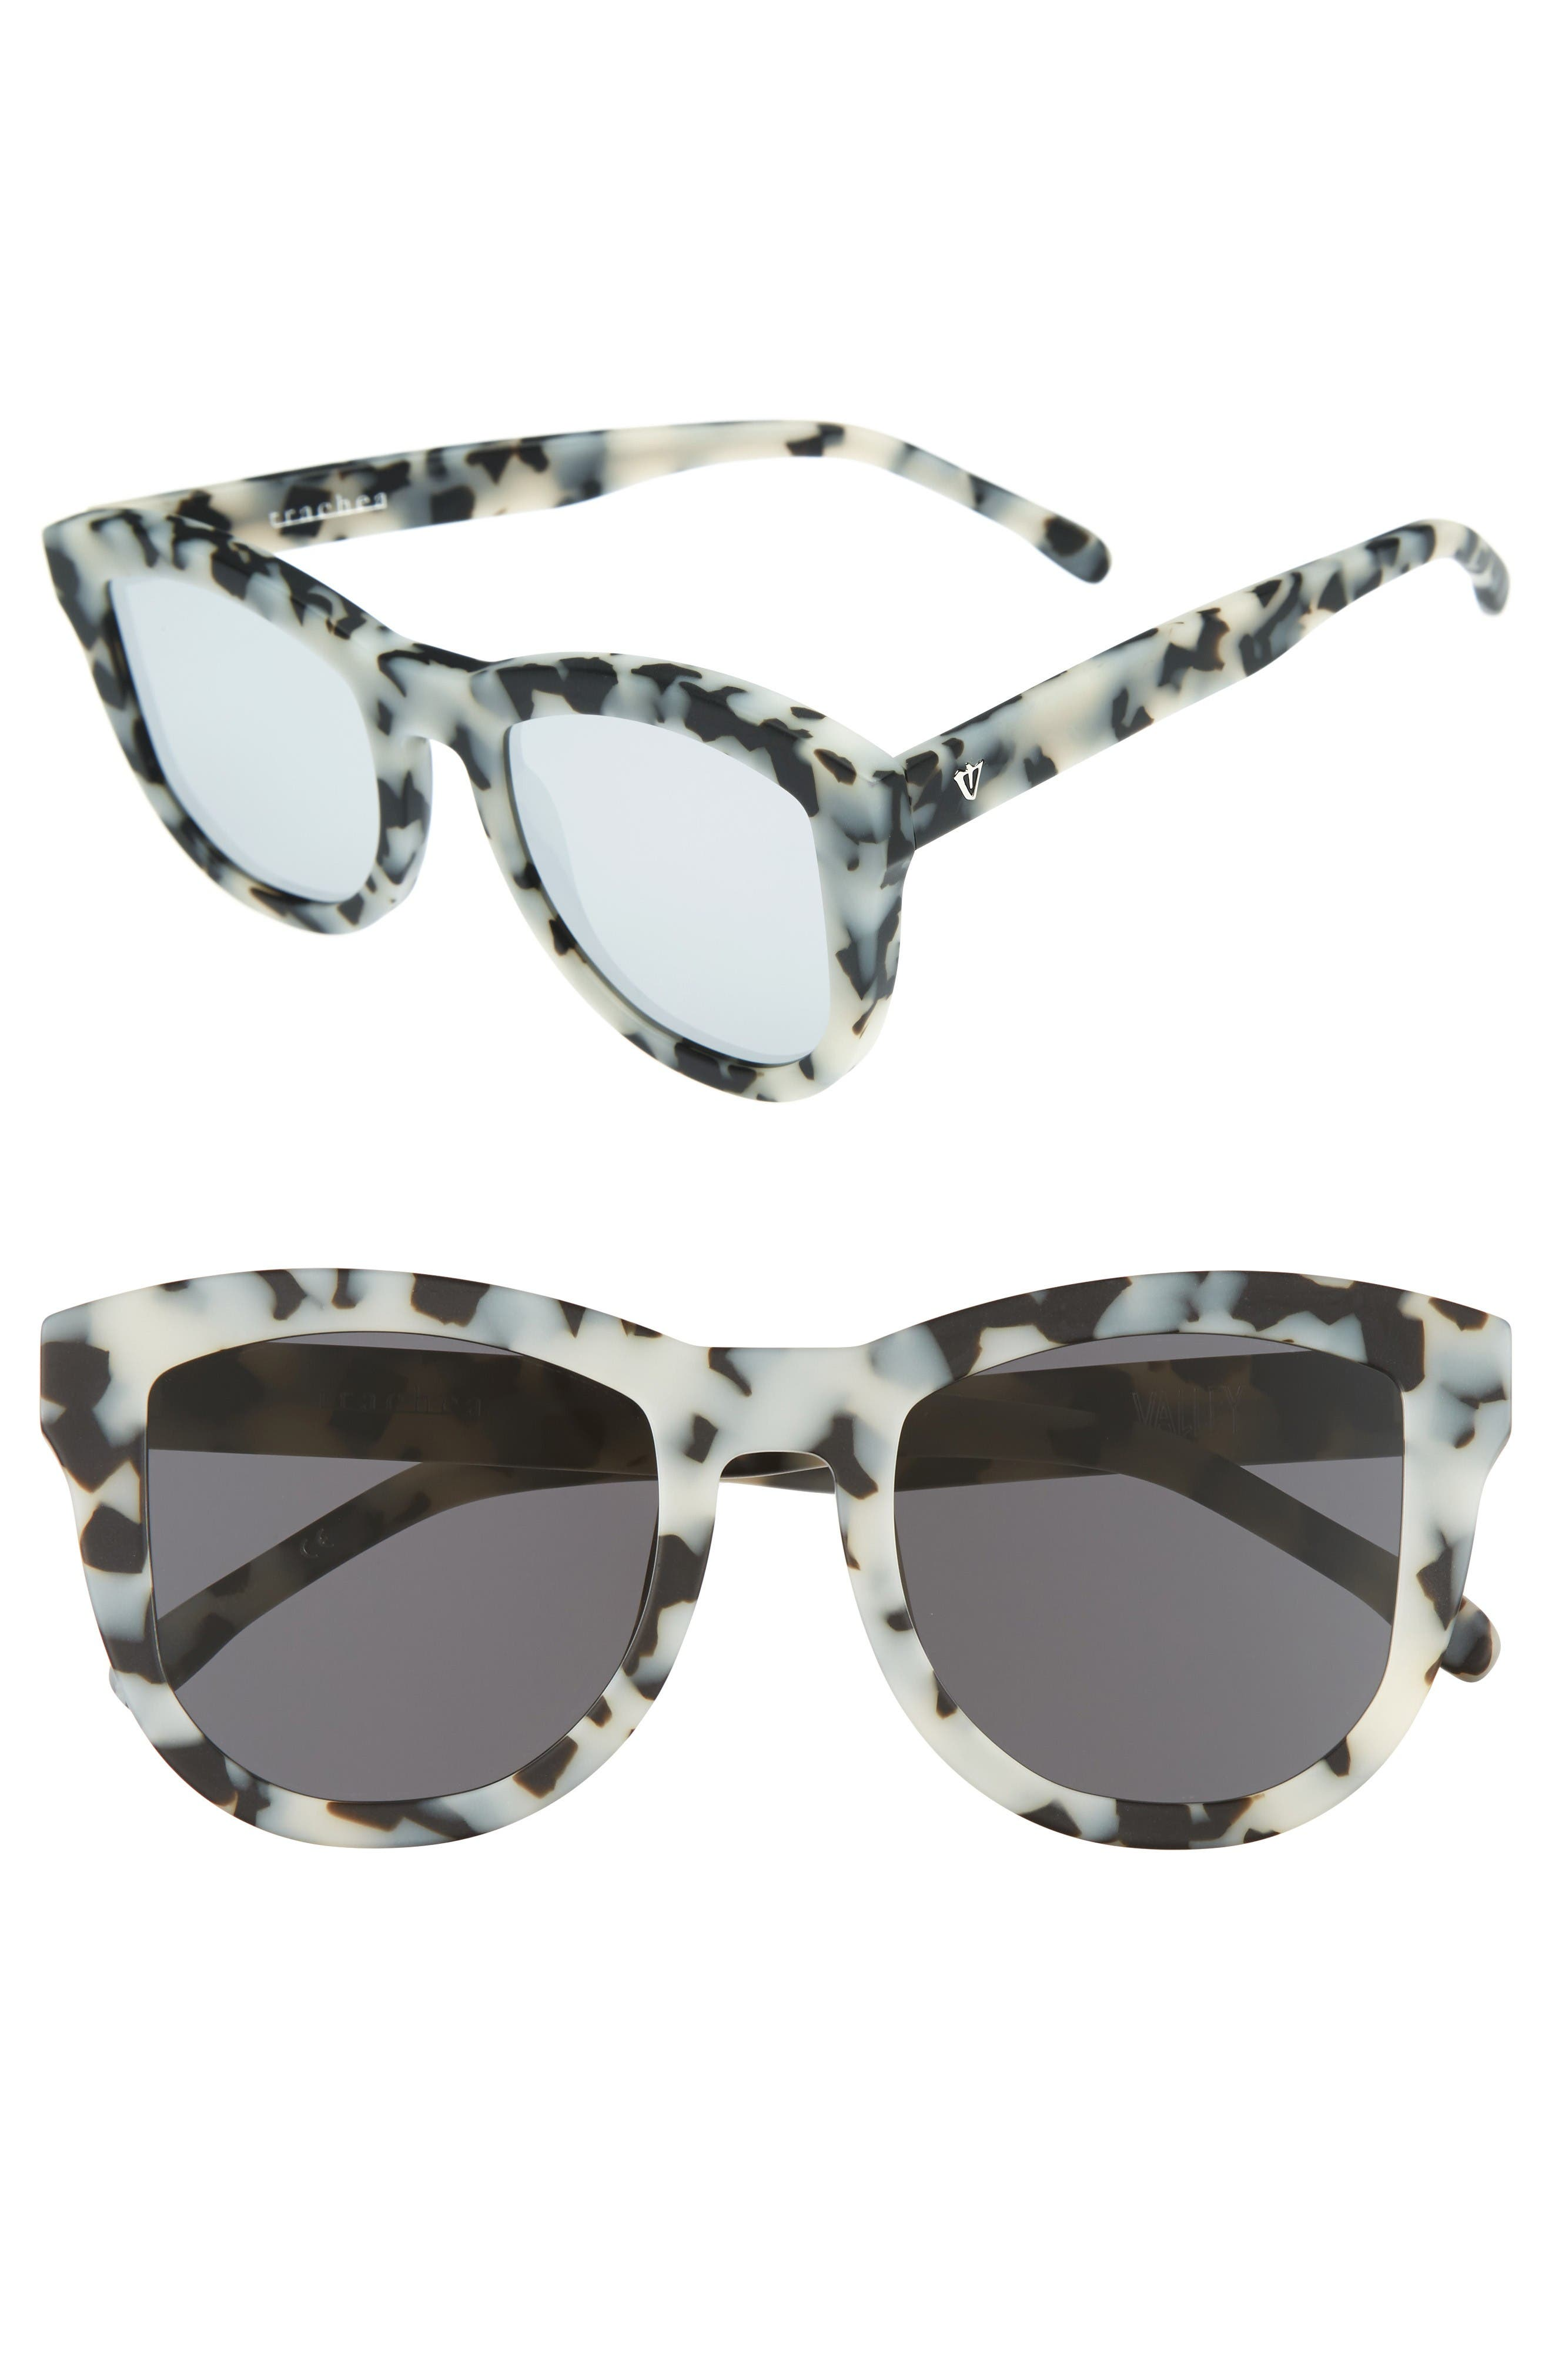 Alternate Image 1 Selected - VALLEY 50mm Trachea Retro Sunglasses